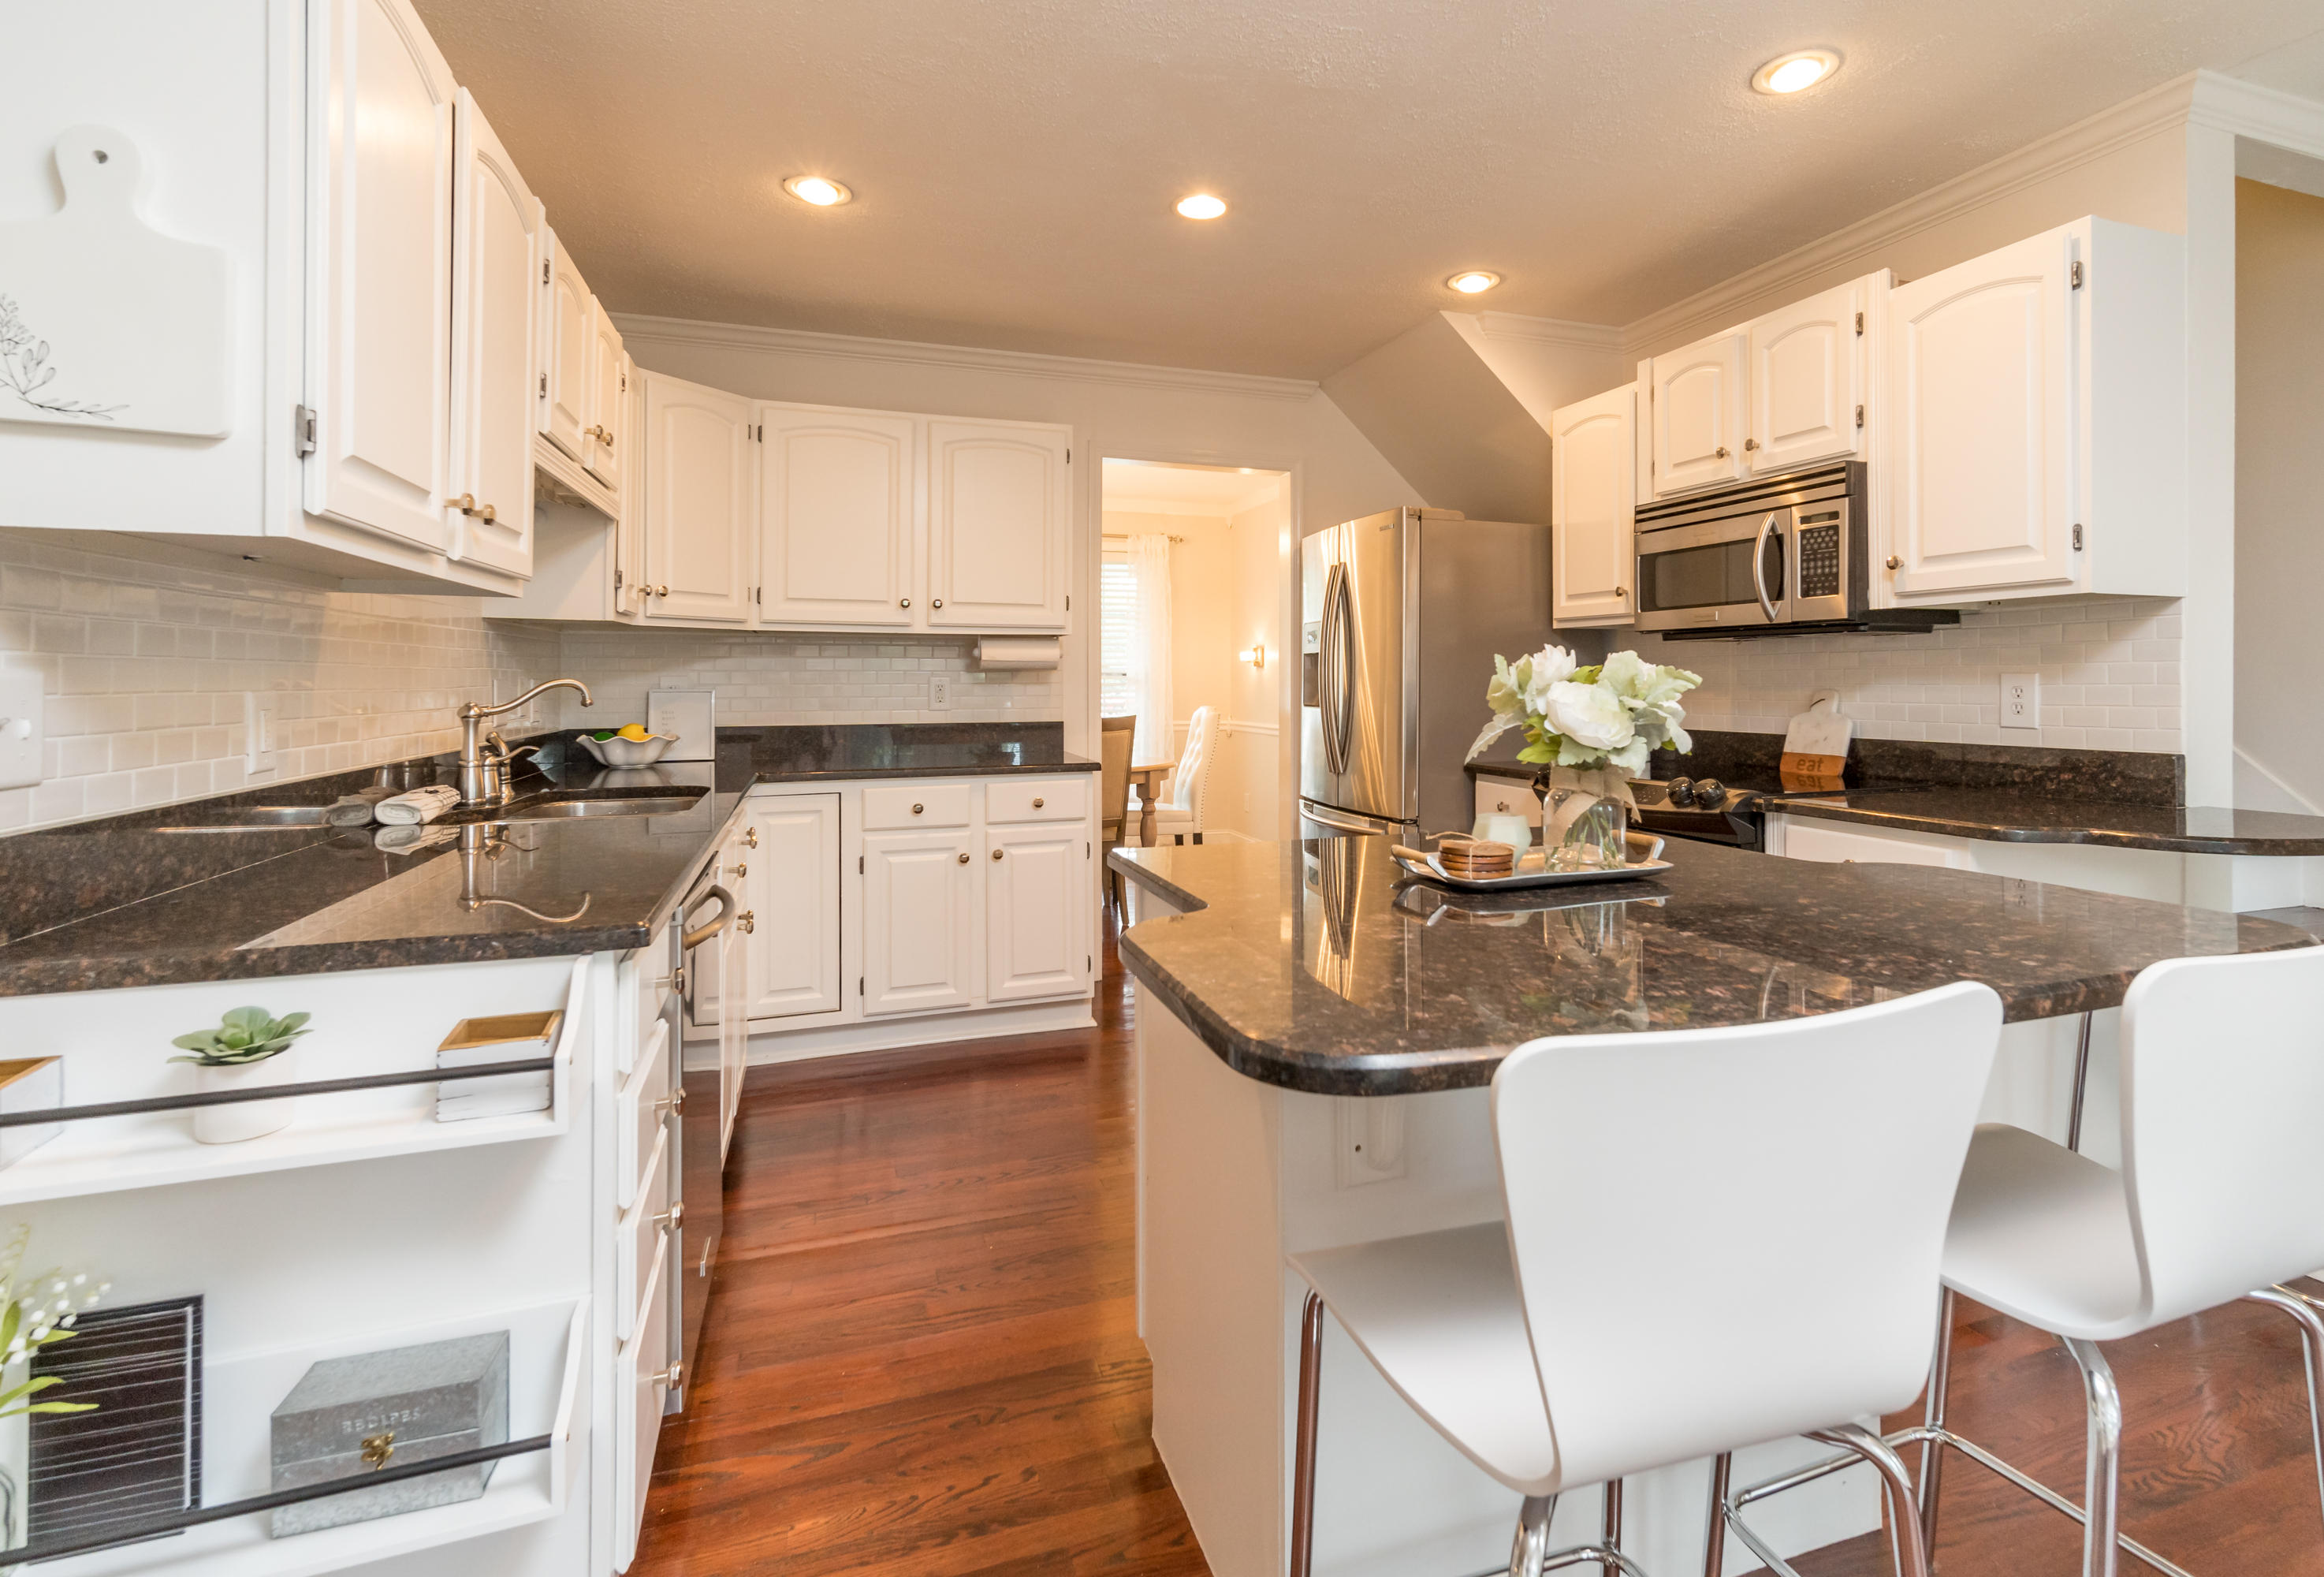 Northwoods Estates Homes For Sale - 8128 Sardis, North Charleston, SC - 0